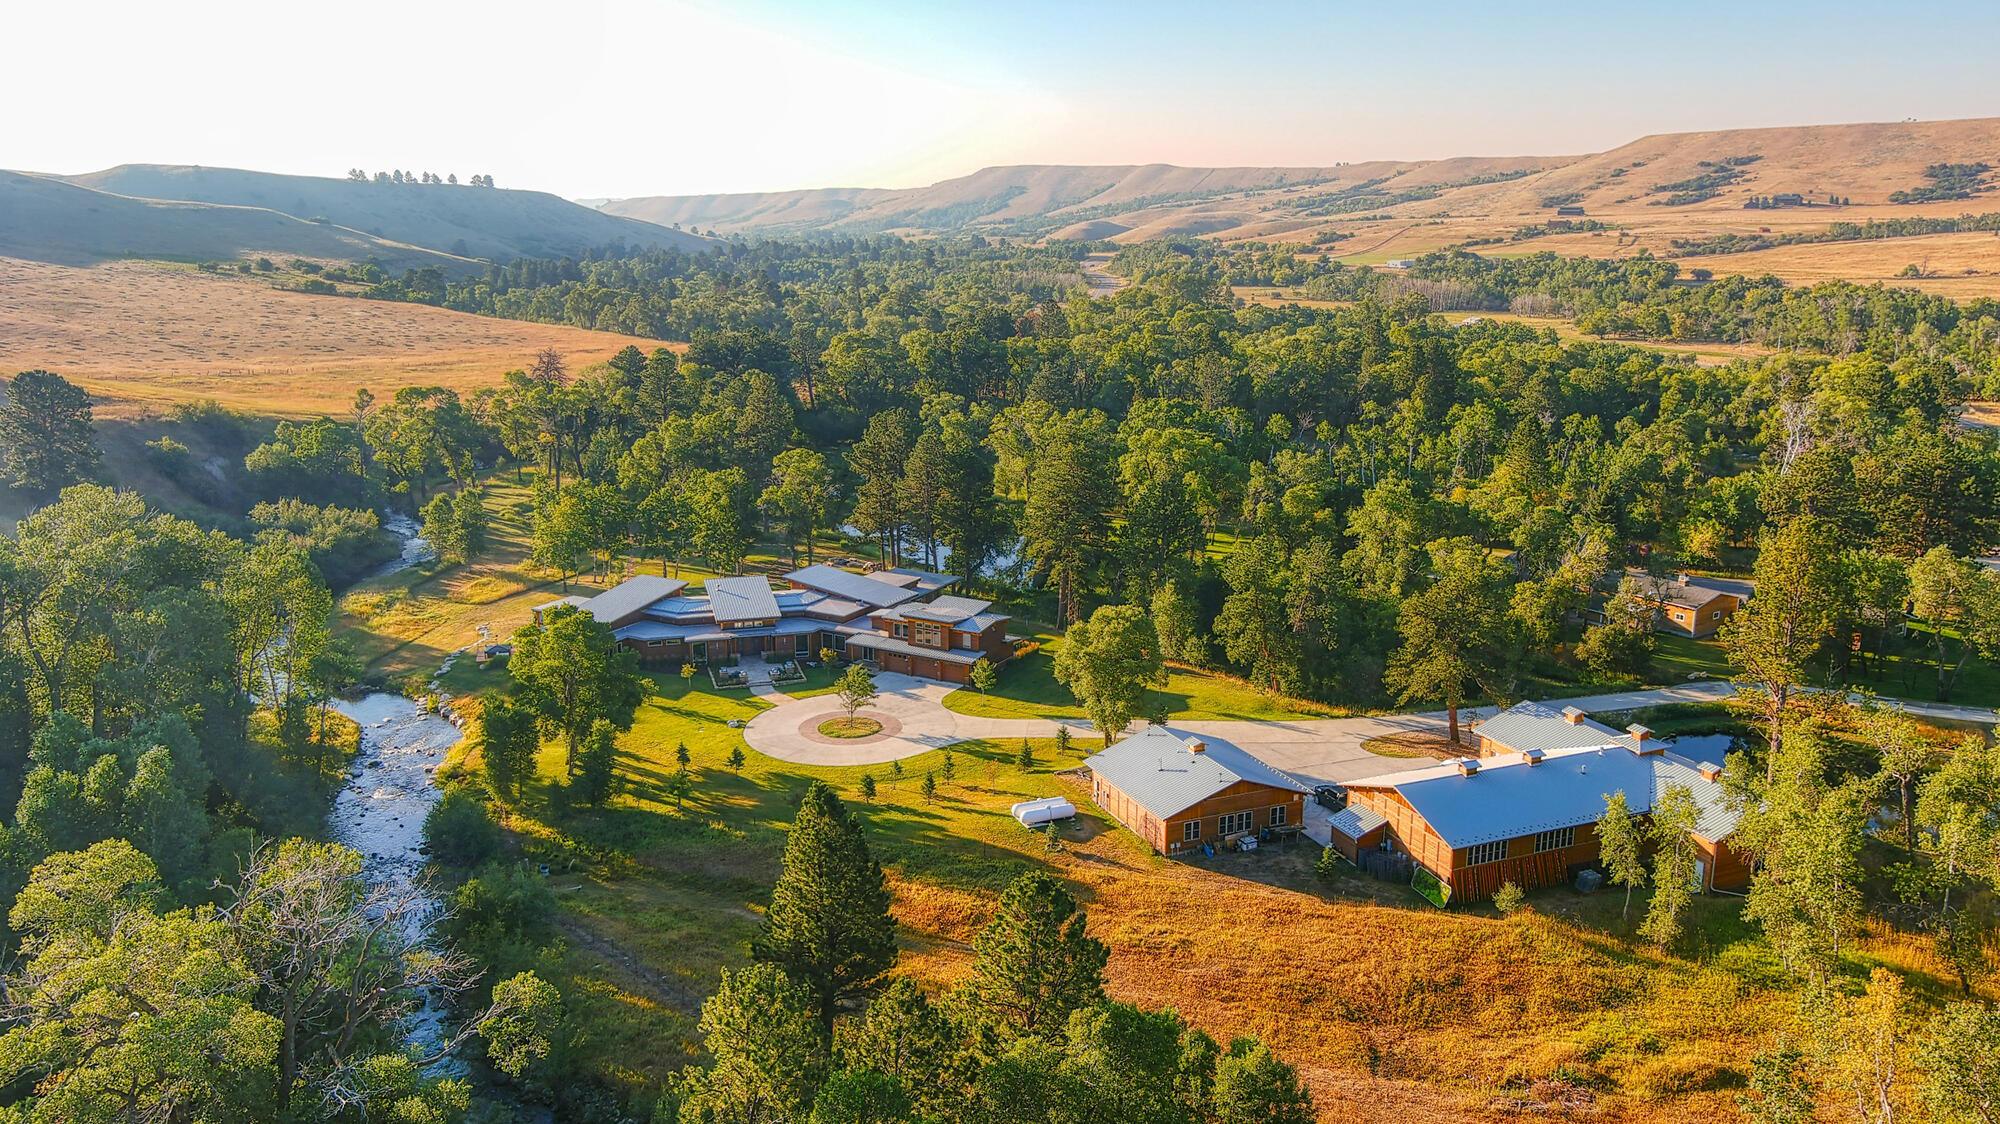 377 St Hwy 193, Banner, Wyoming 82842, 7 Bedrooms Bedrooms, ,7.5 BathroomsBathrooms,Residential,For Sale,St Hwy 193,20-902